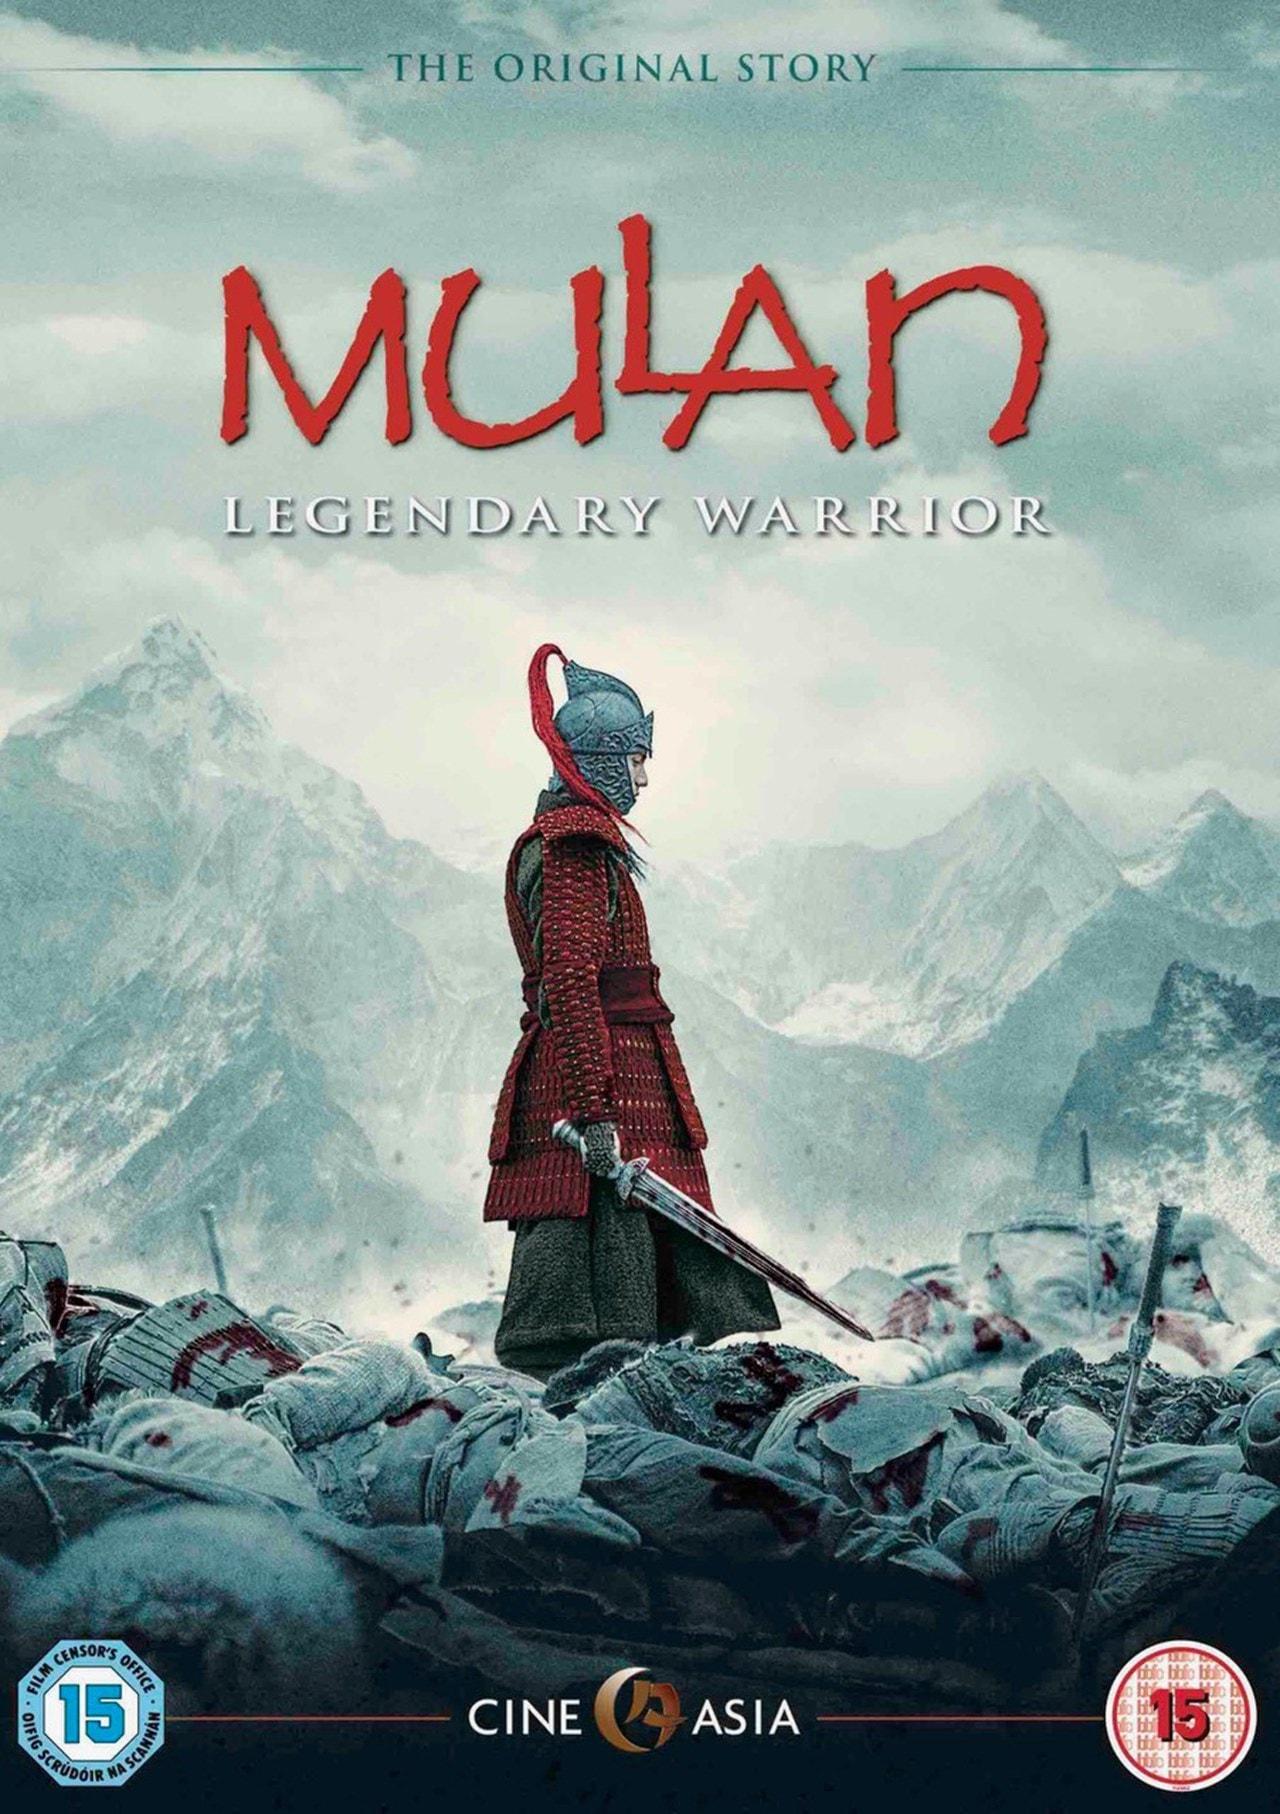 Mulan | DVD | Free shipping over £20 | HMV Store